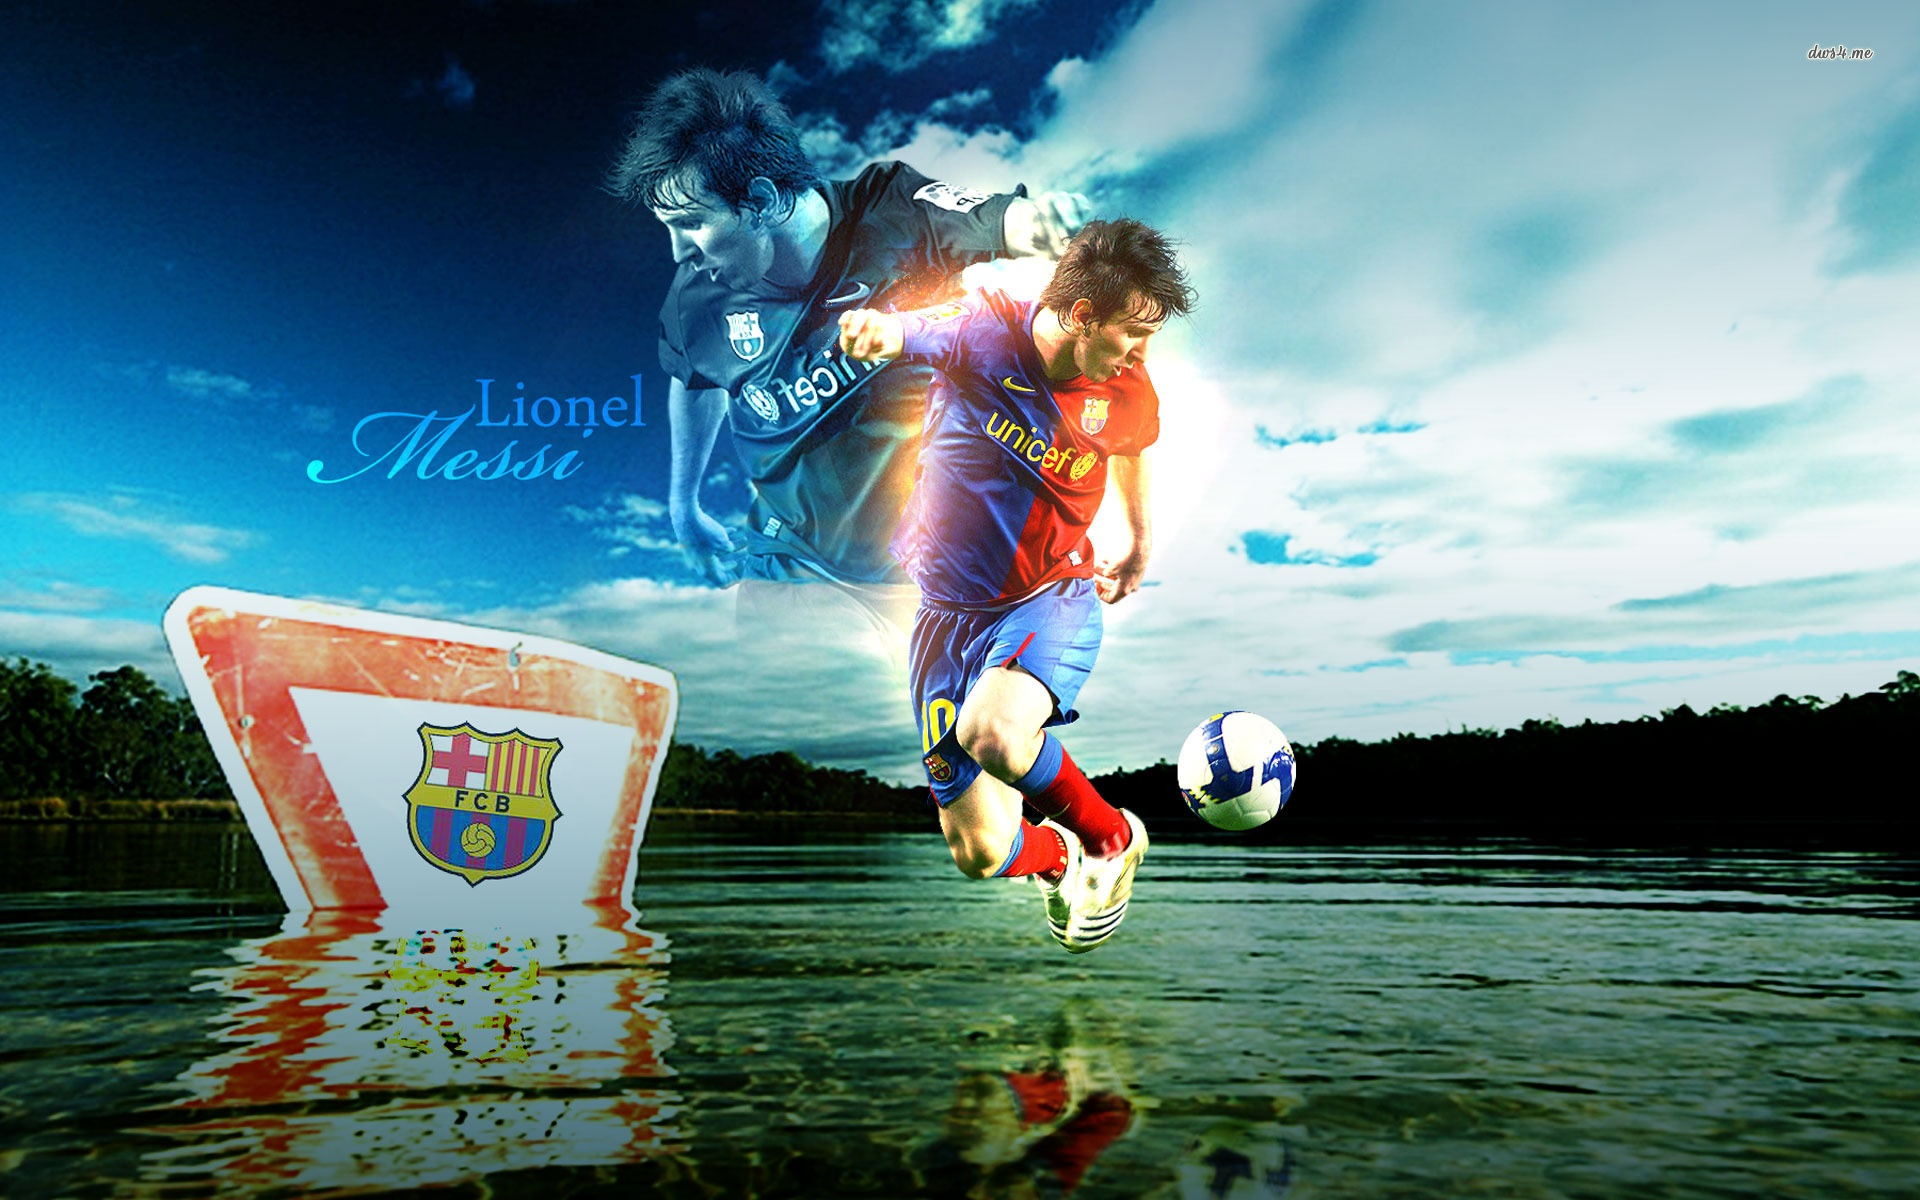 Lionel Messi HD Desktop Wallpaper HD Desktop Wallpaper 1920x1200